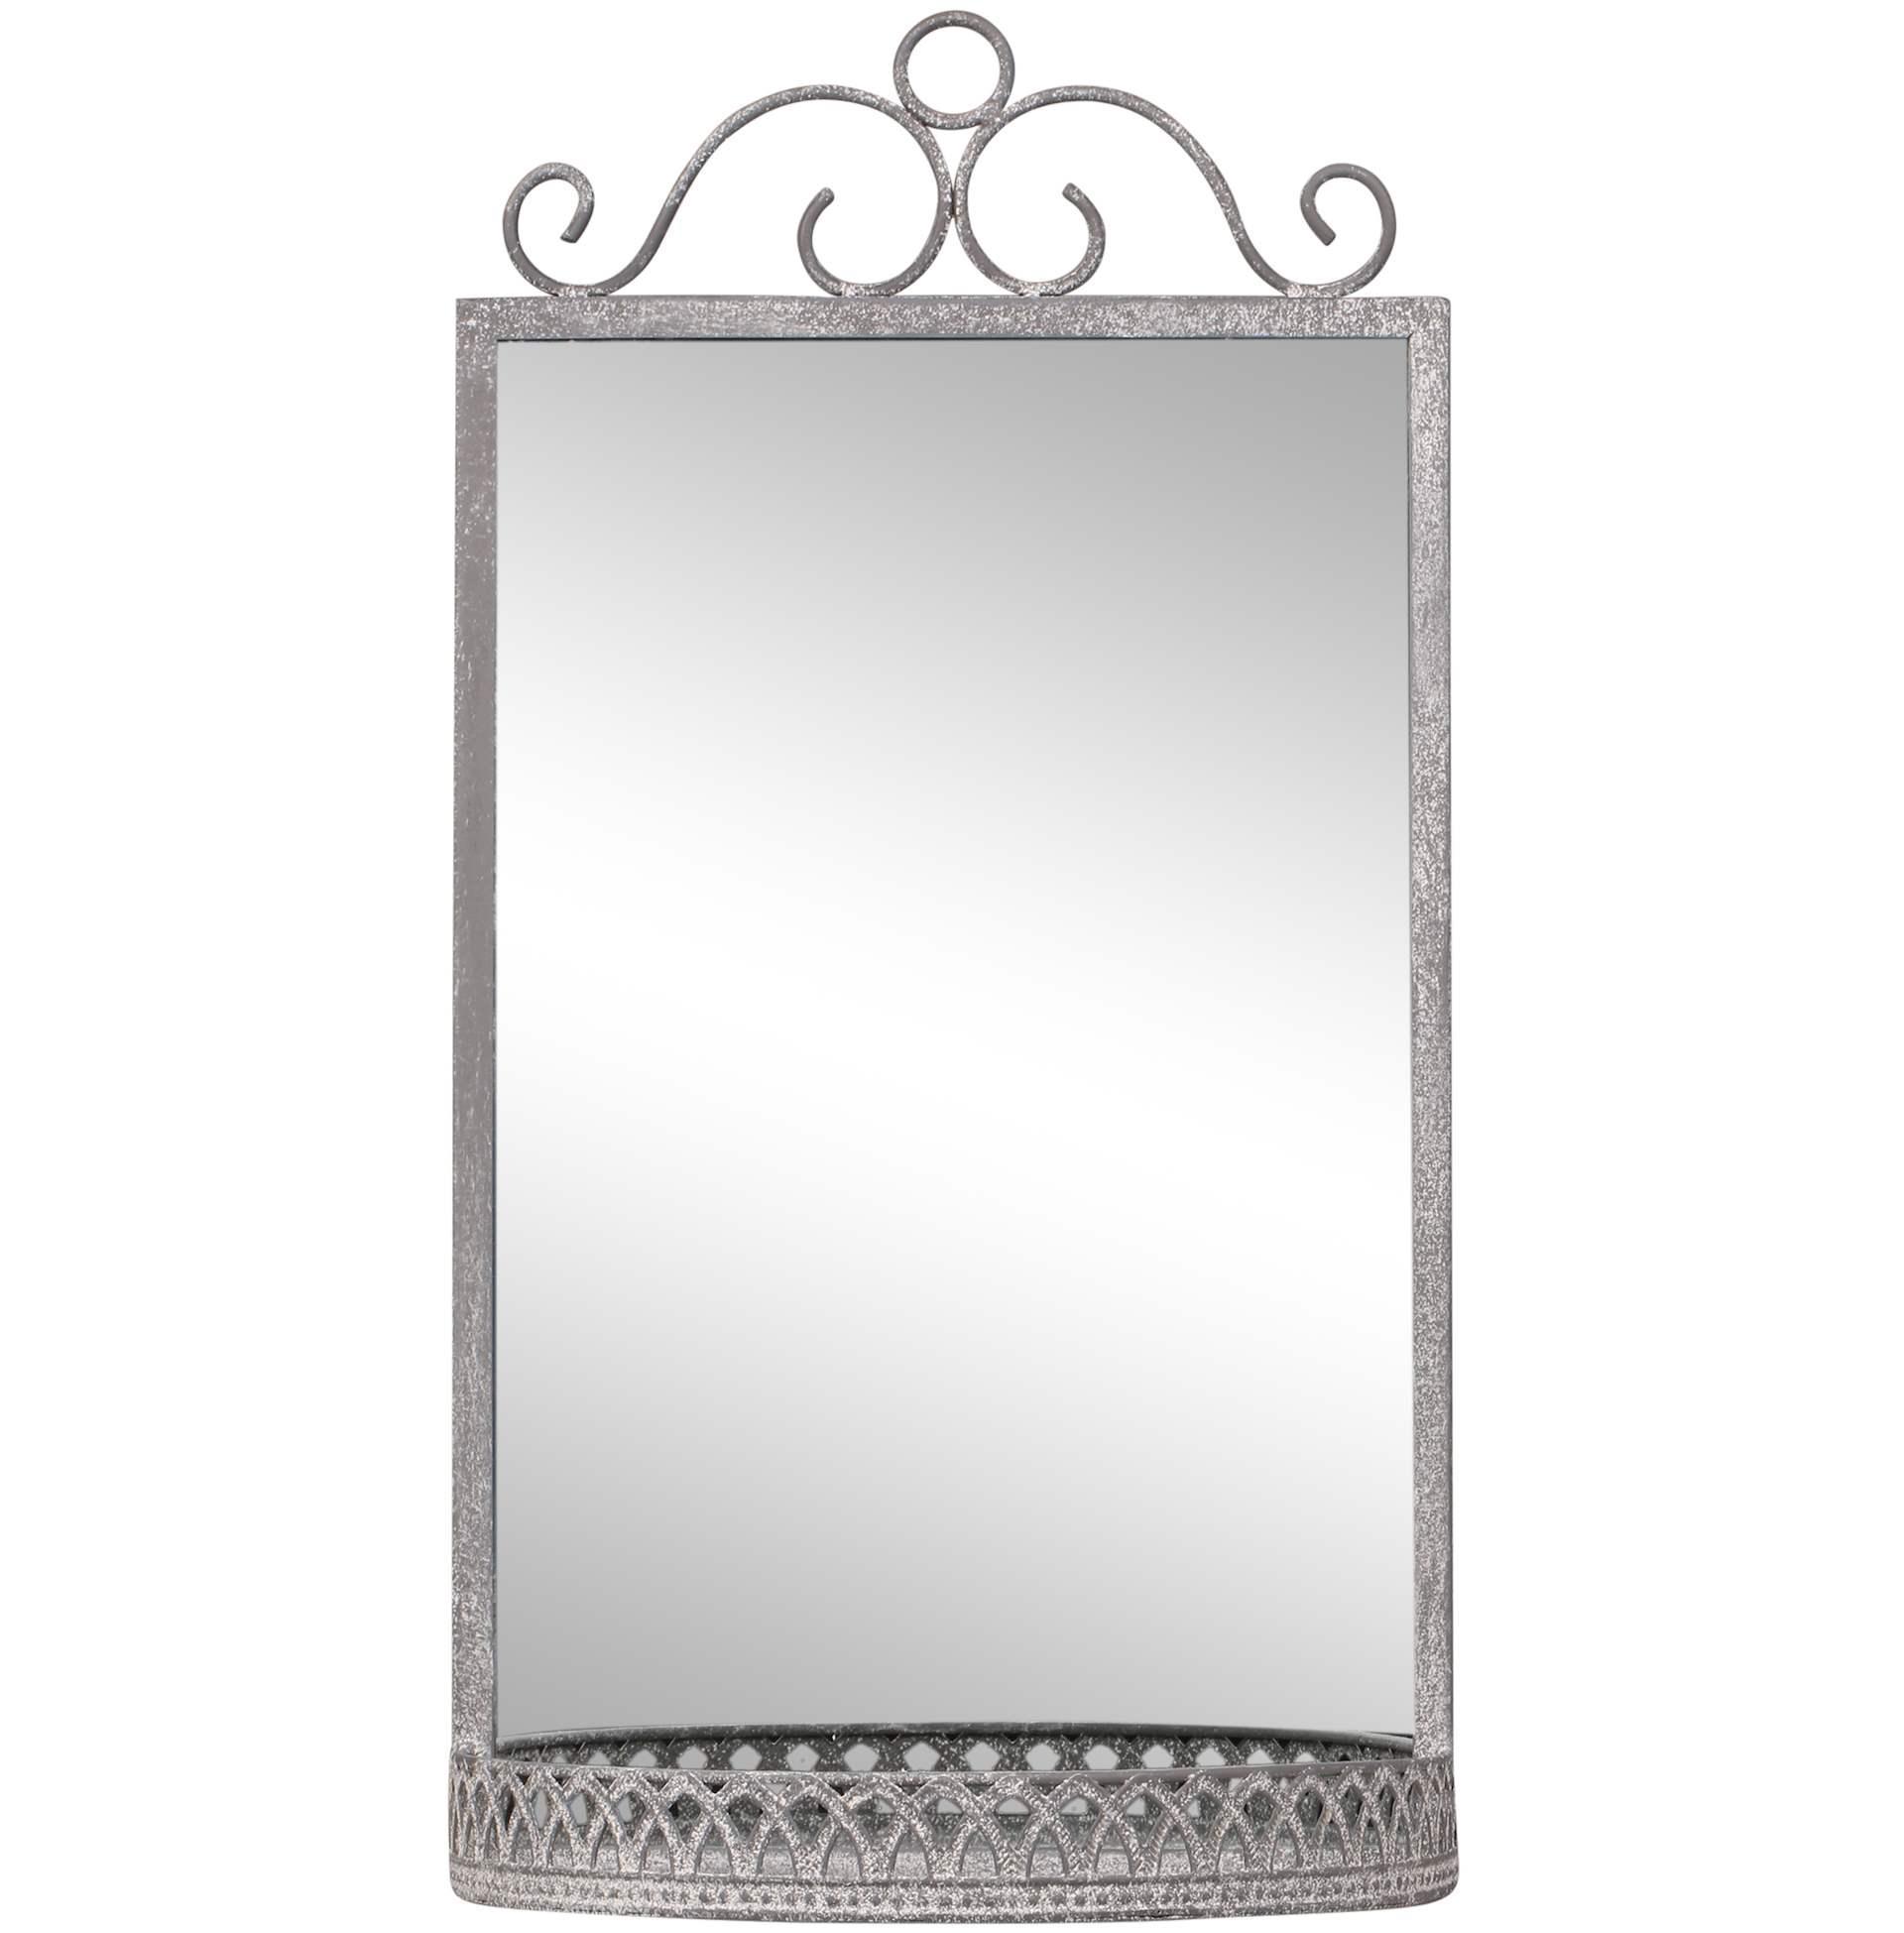 Chic Antique Zrkadlo s poličkou Antique Zinc